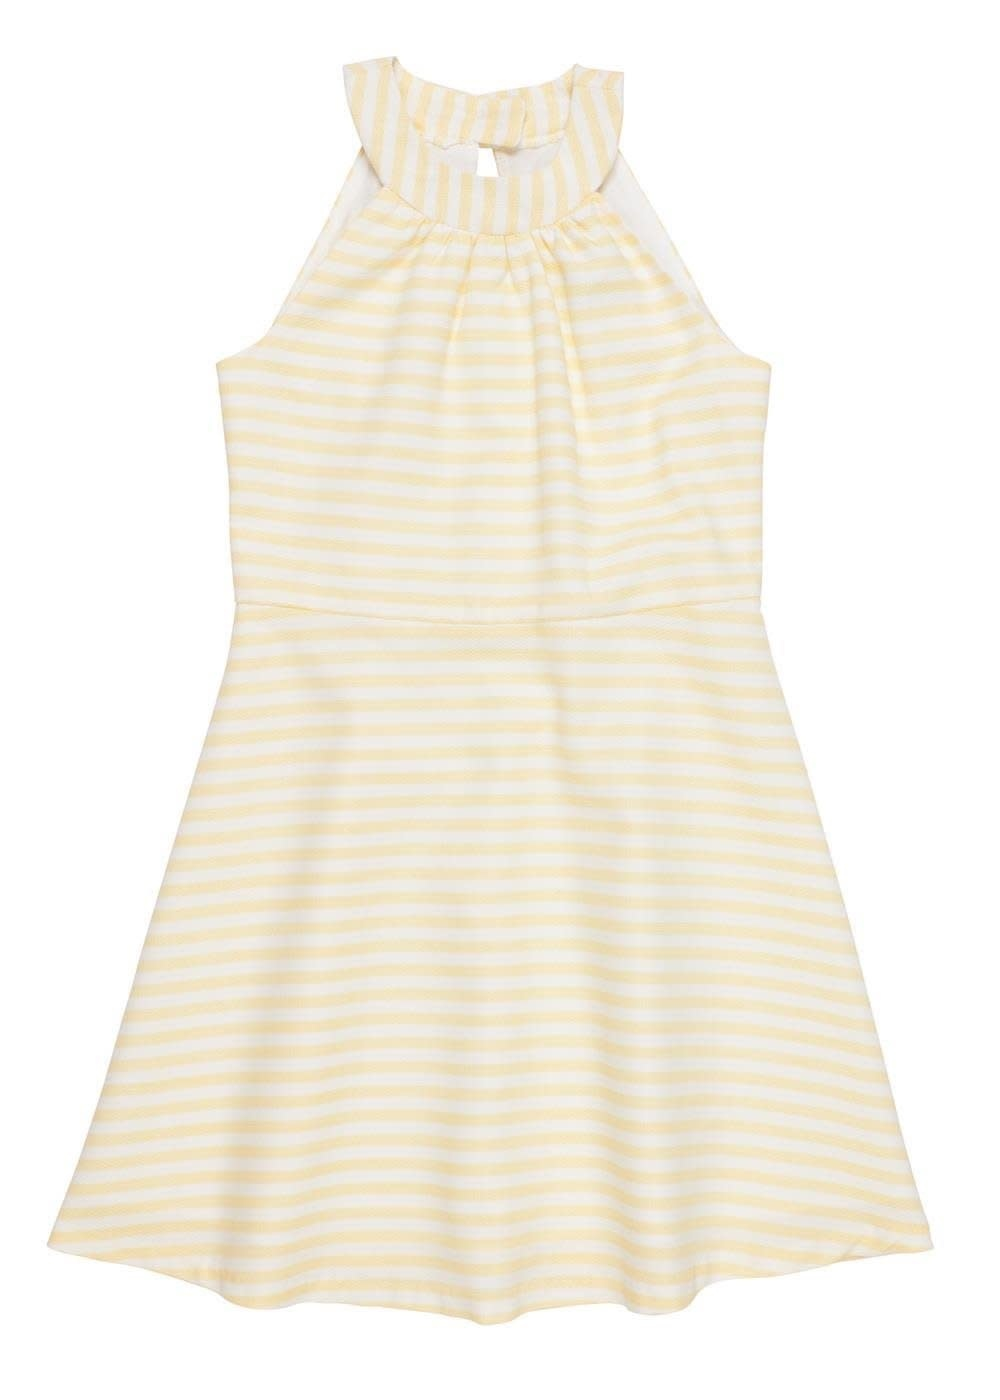 Florence Eiseman Yellow Stripe Pique Dress